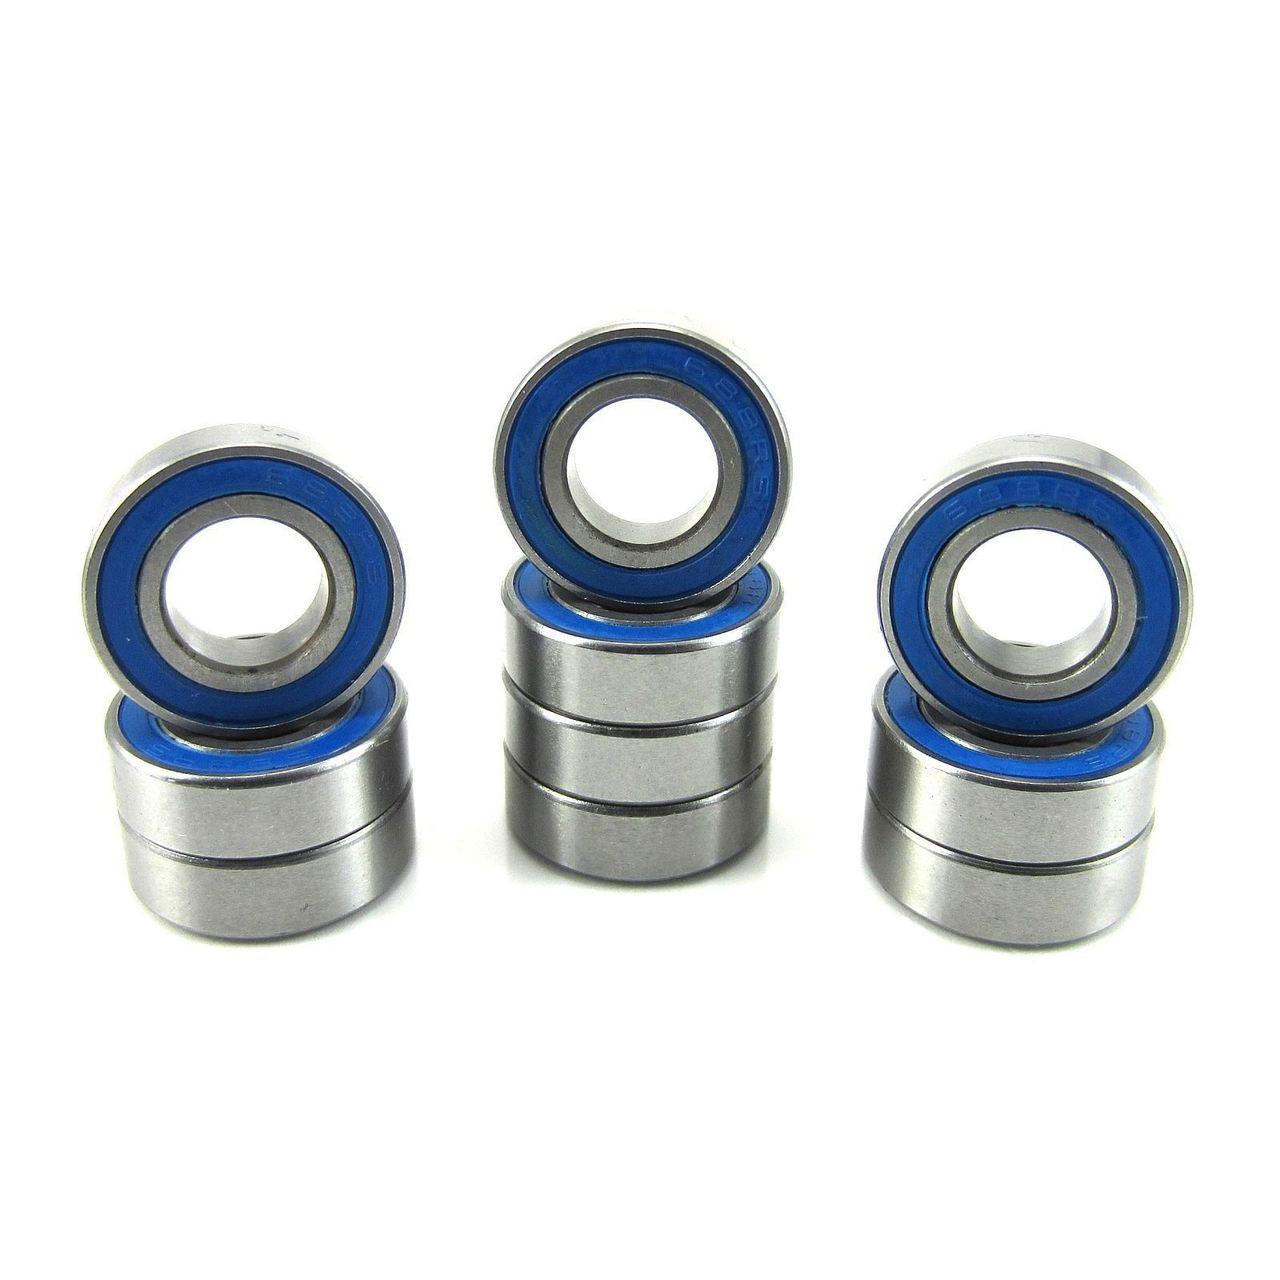 TRB RC 8x16x5mm Precision Ball Bearings ABEC 3 Rubber Sealed BLU (10)